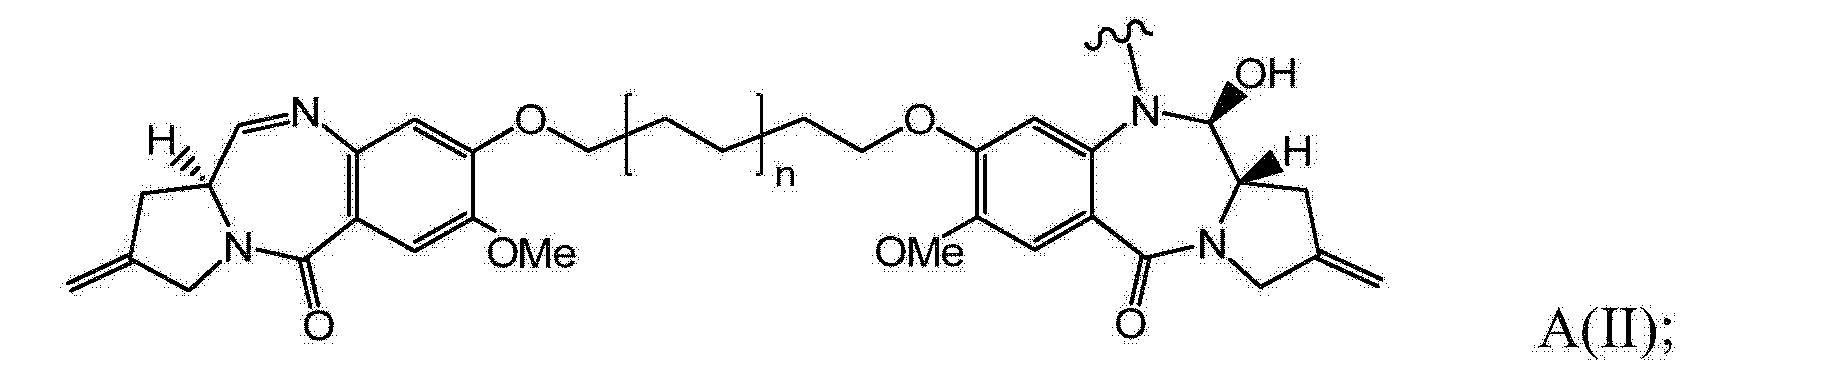 Figure CN104411721AD00723